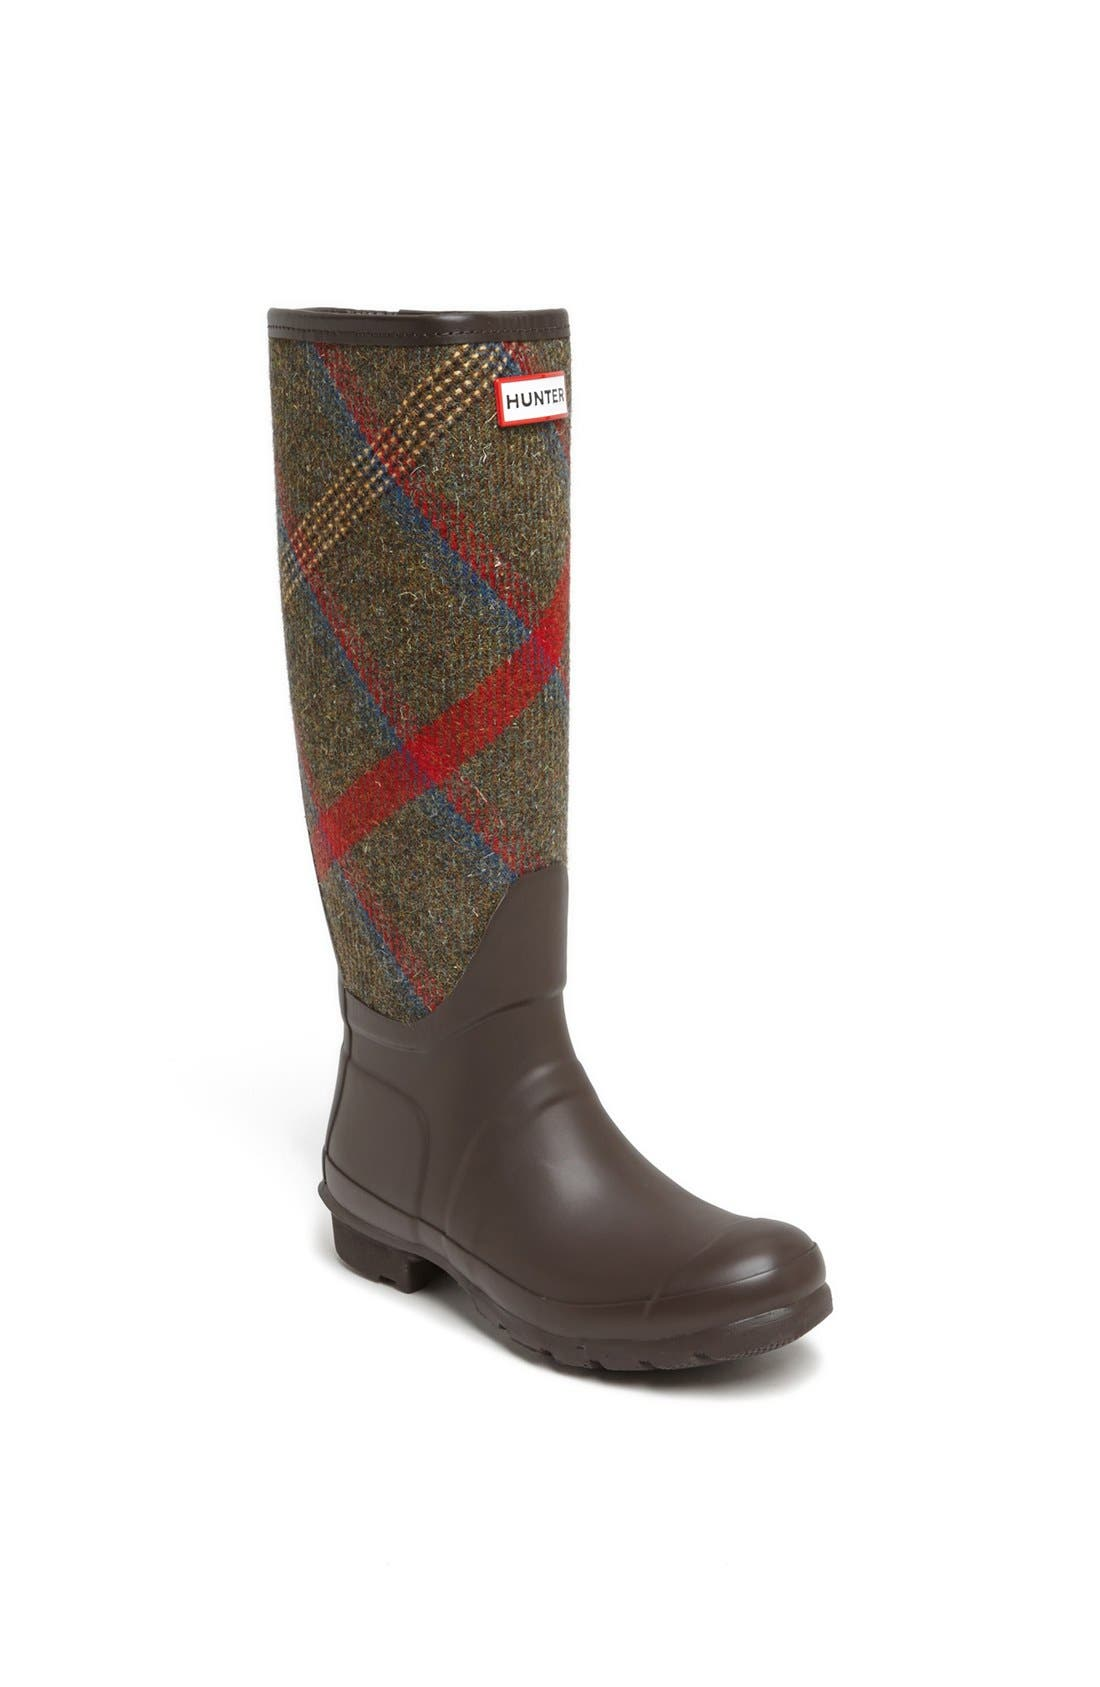 HUNTER 'Original Mallalieus' Plaid Rain Boot, Main, color, 205